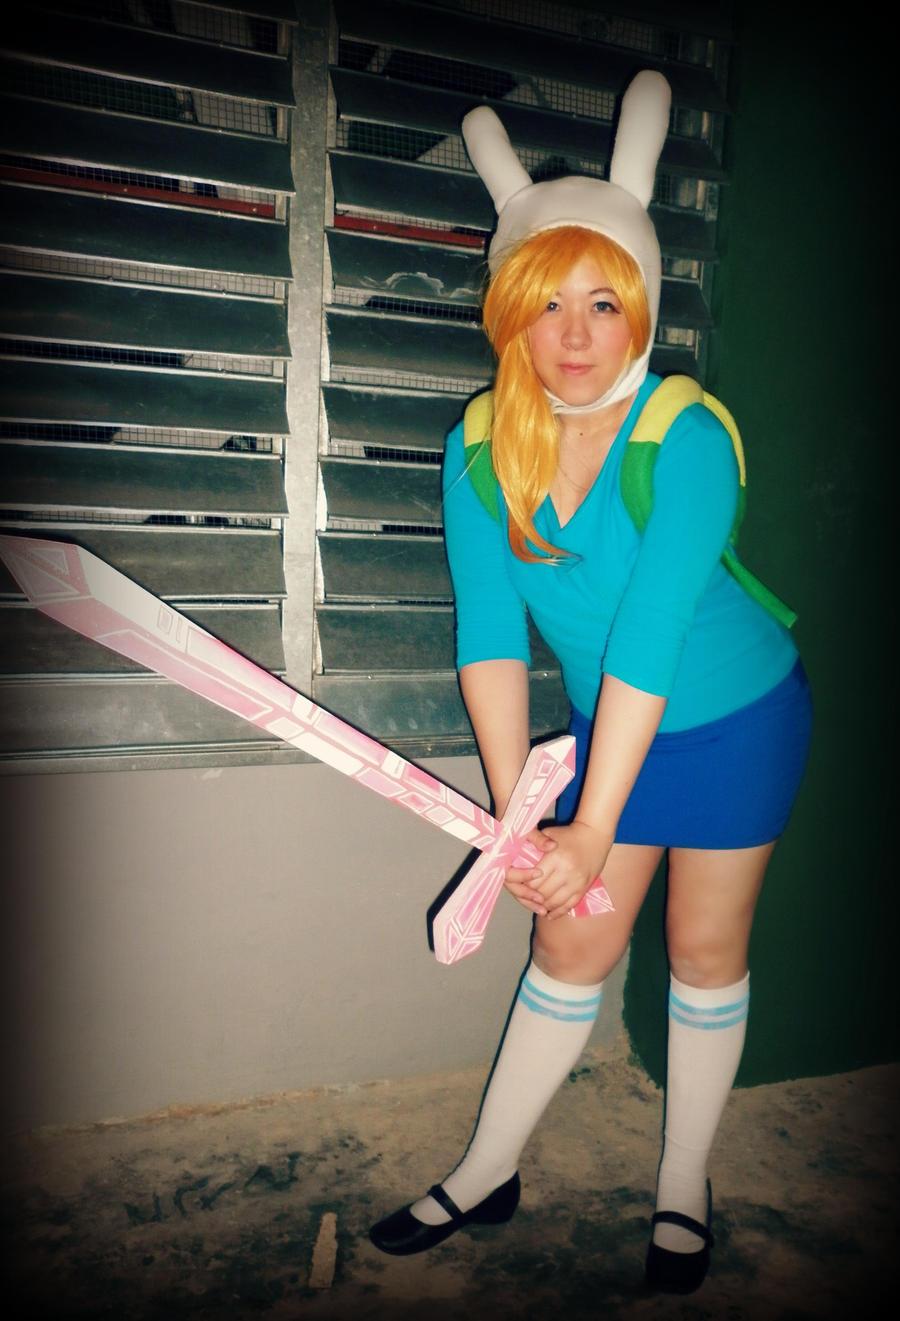 Fiona adventure time cosplay